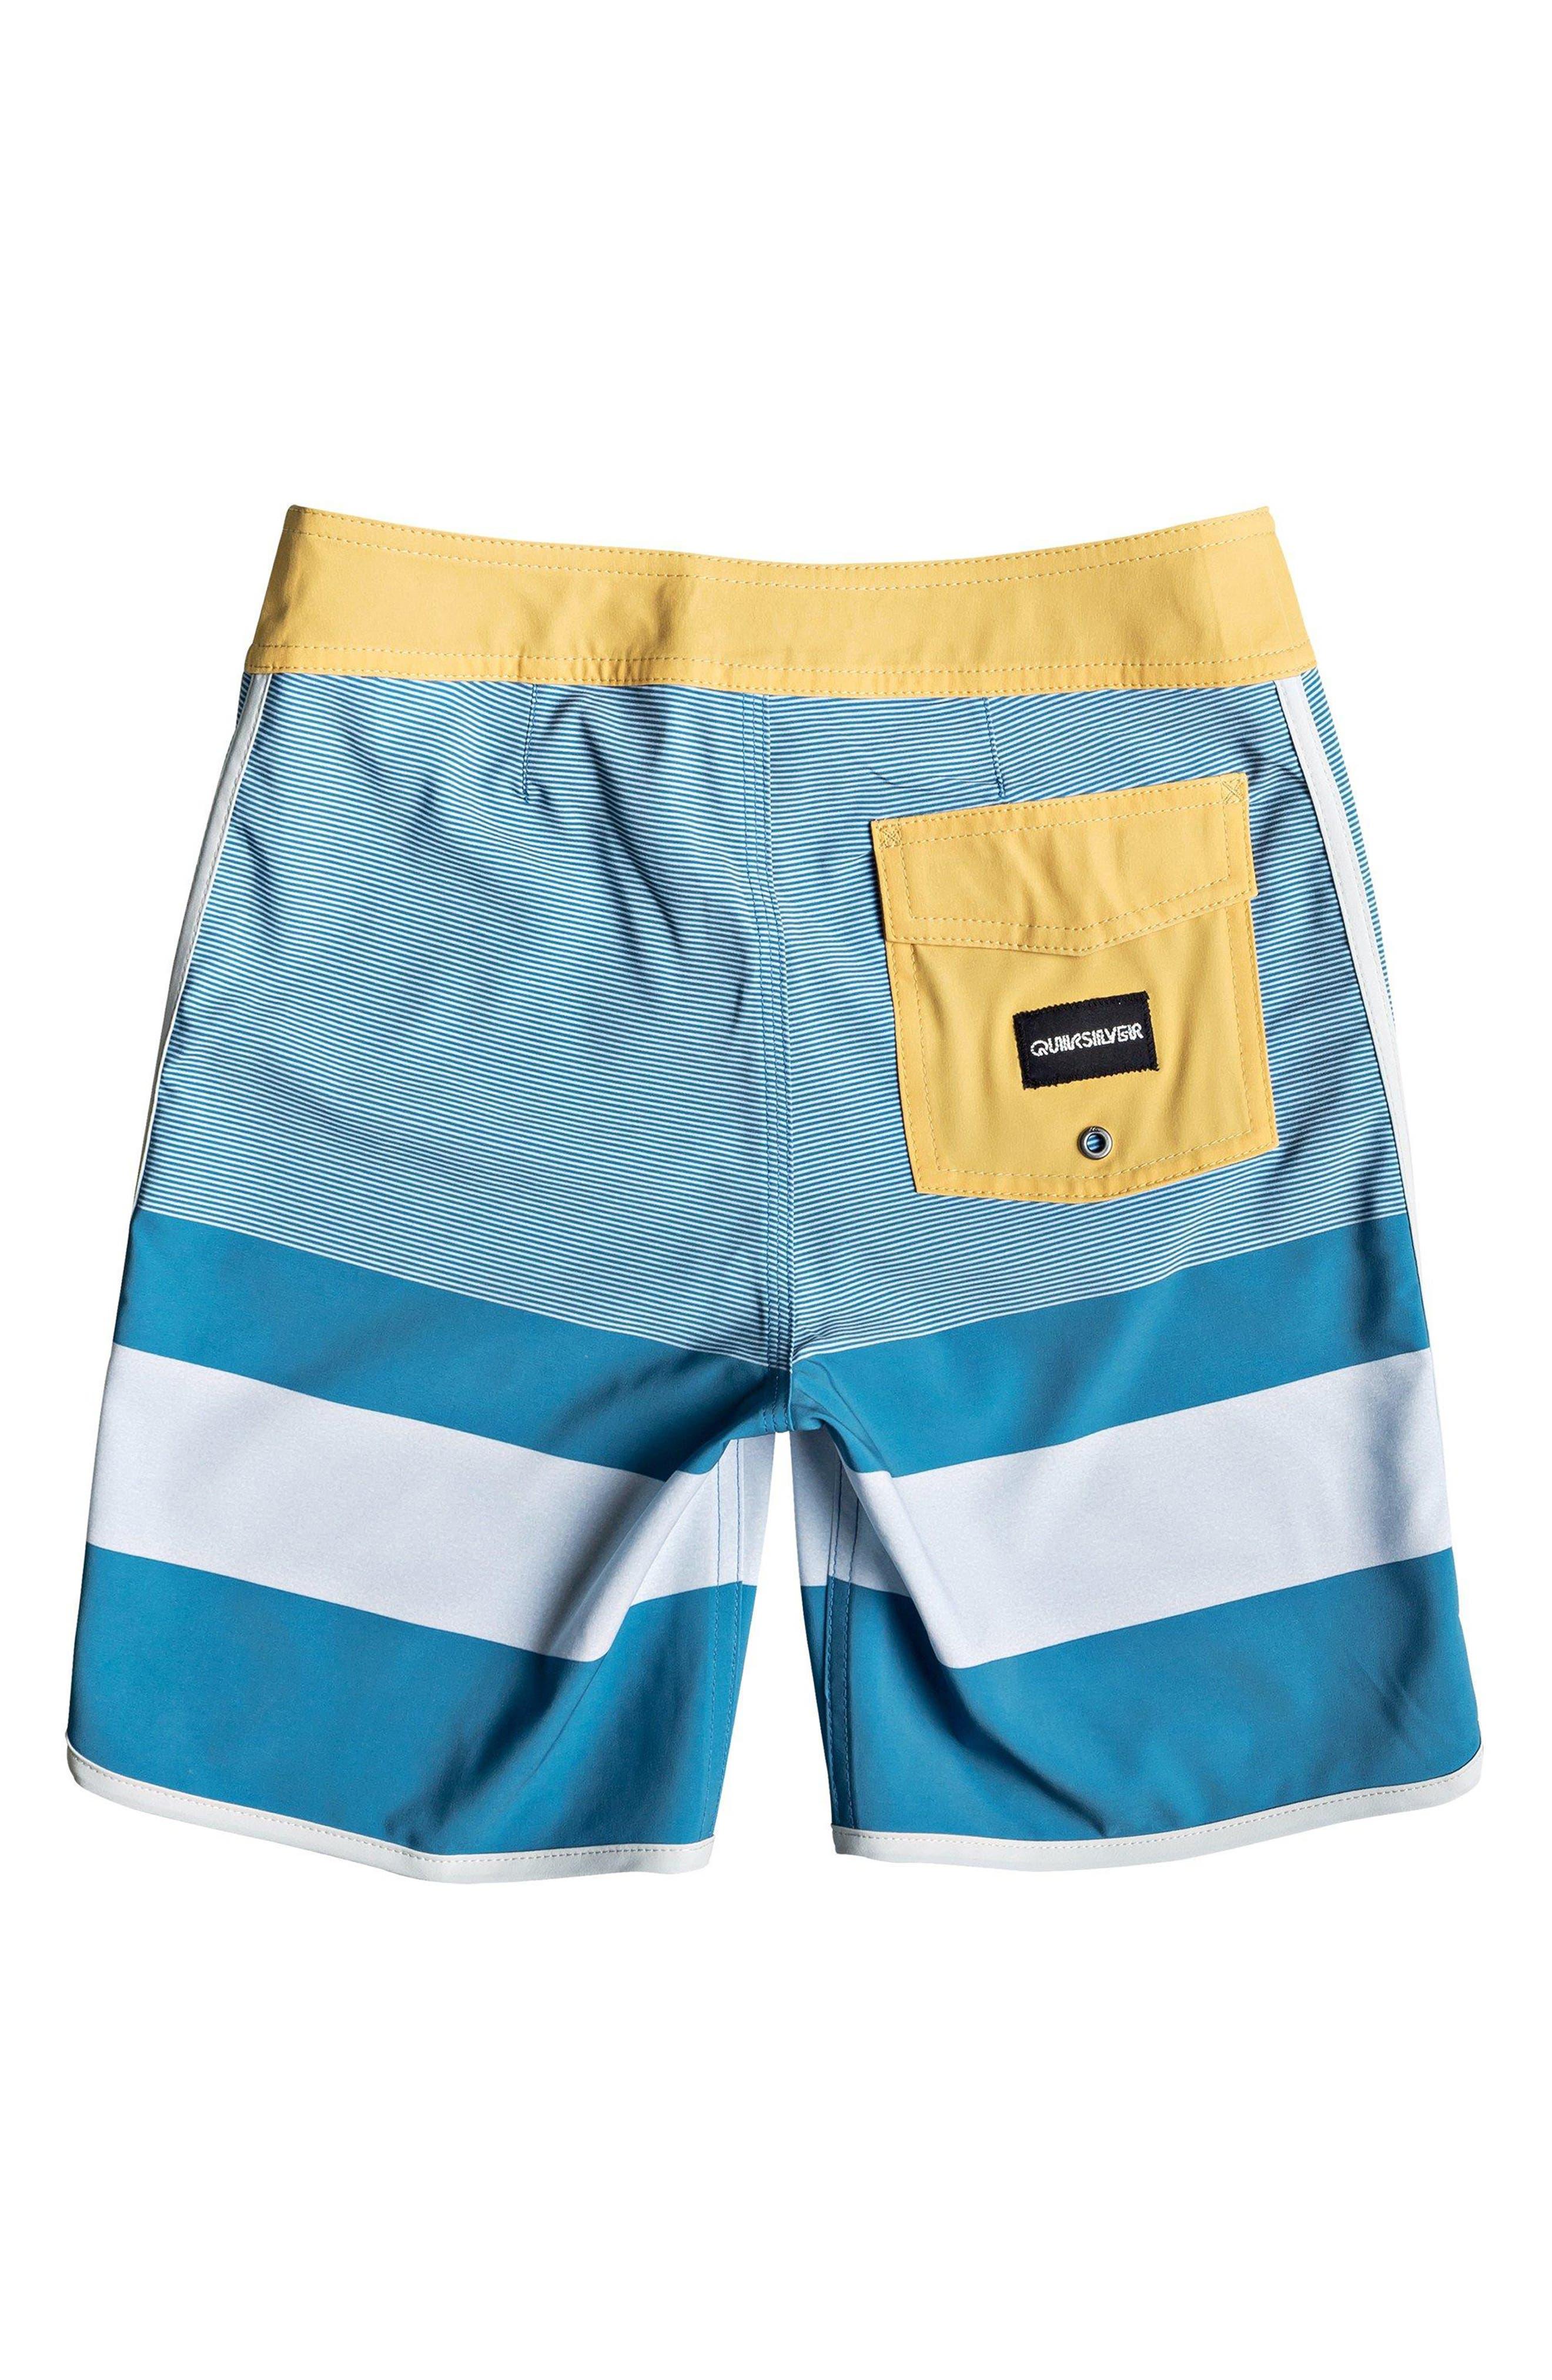 QUIKSILVER, Highline Tijuana Board Shorts, Alternate thumbnail 2, color, SOUTHERN OCEAN